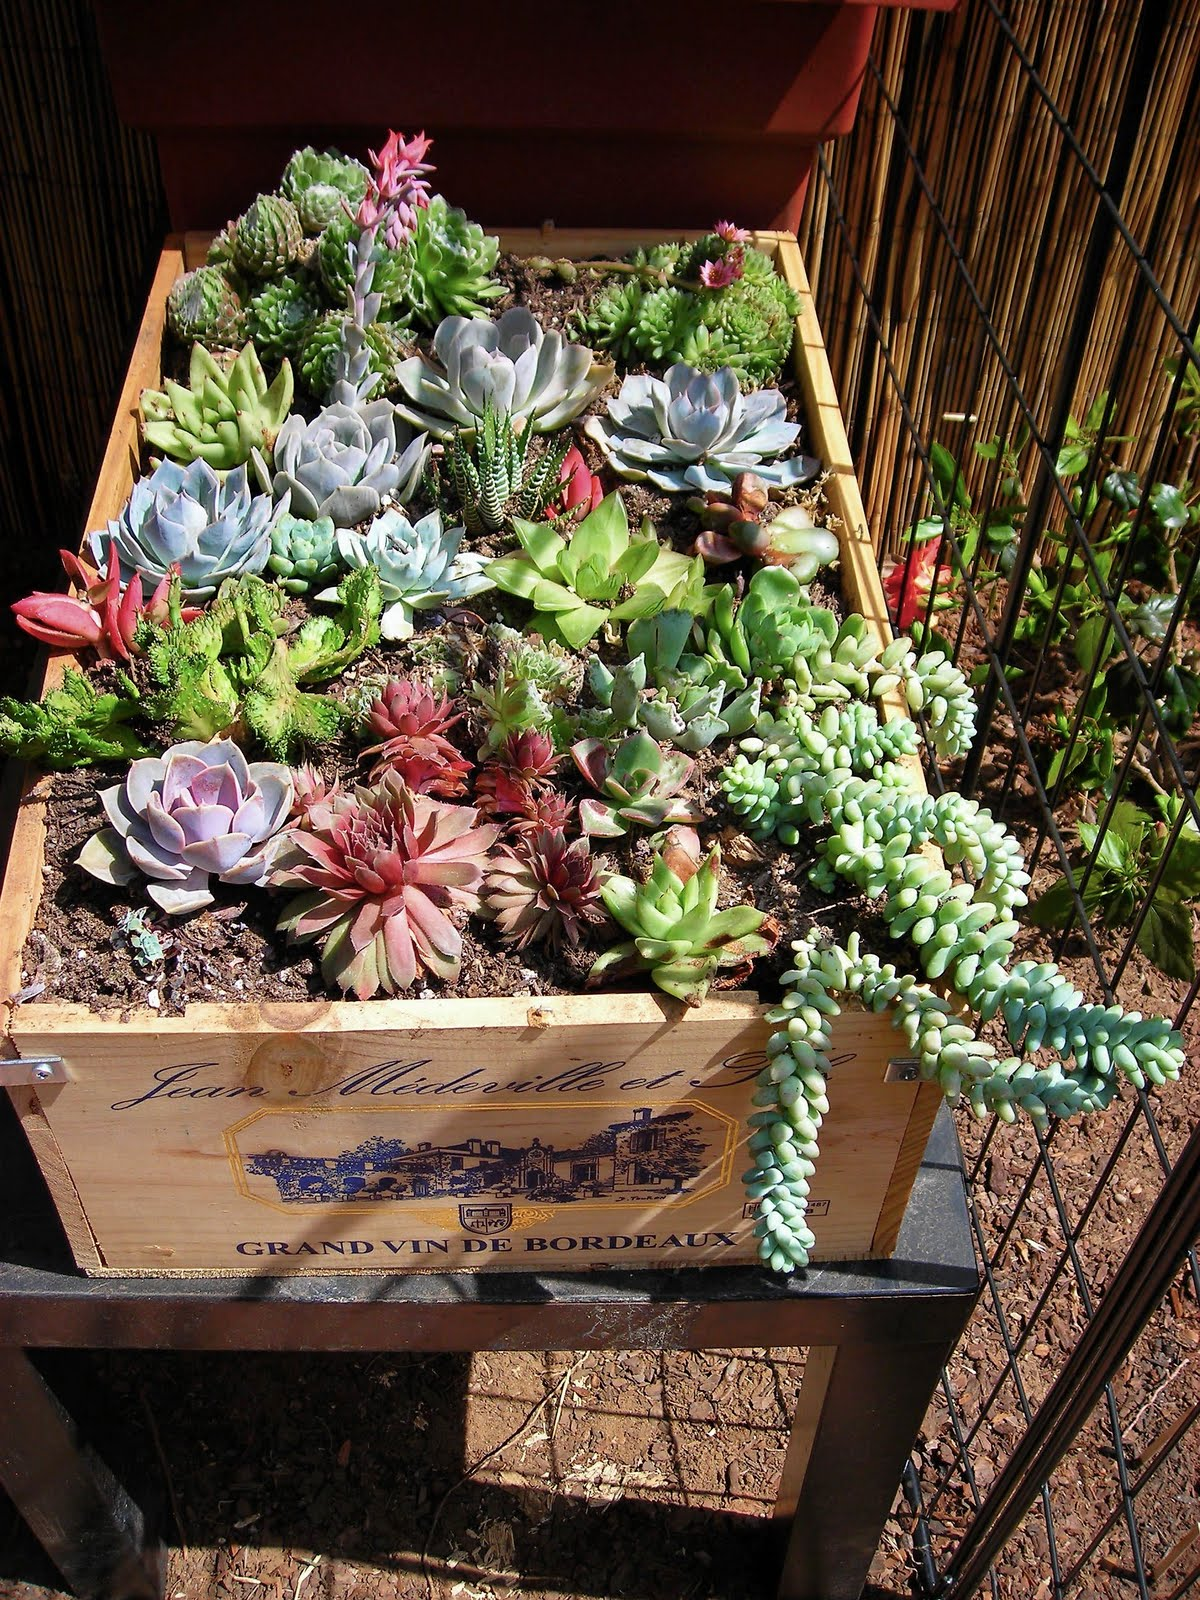 Garden-succulent-in-a-wine-crate